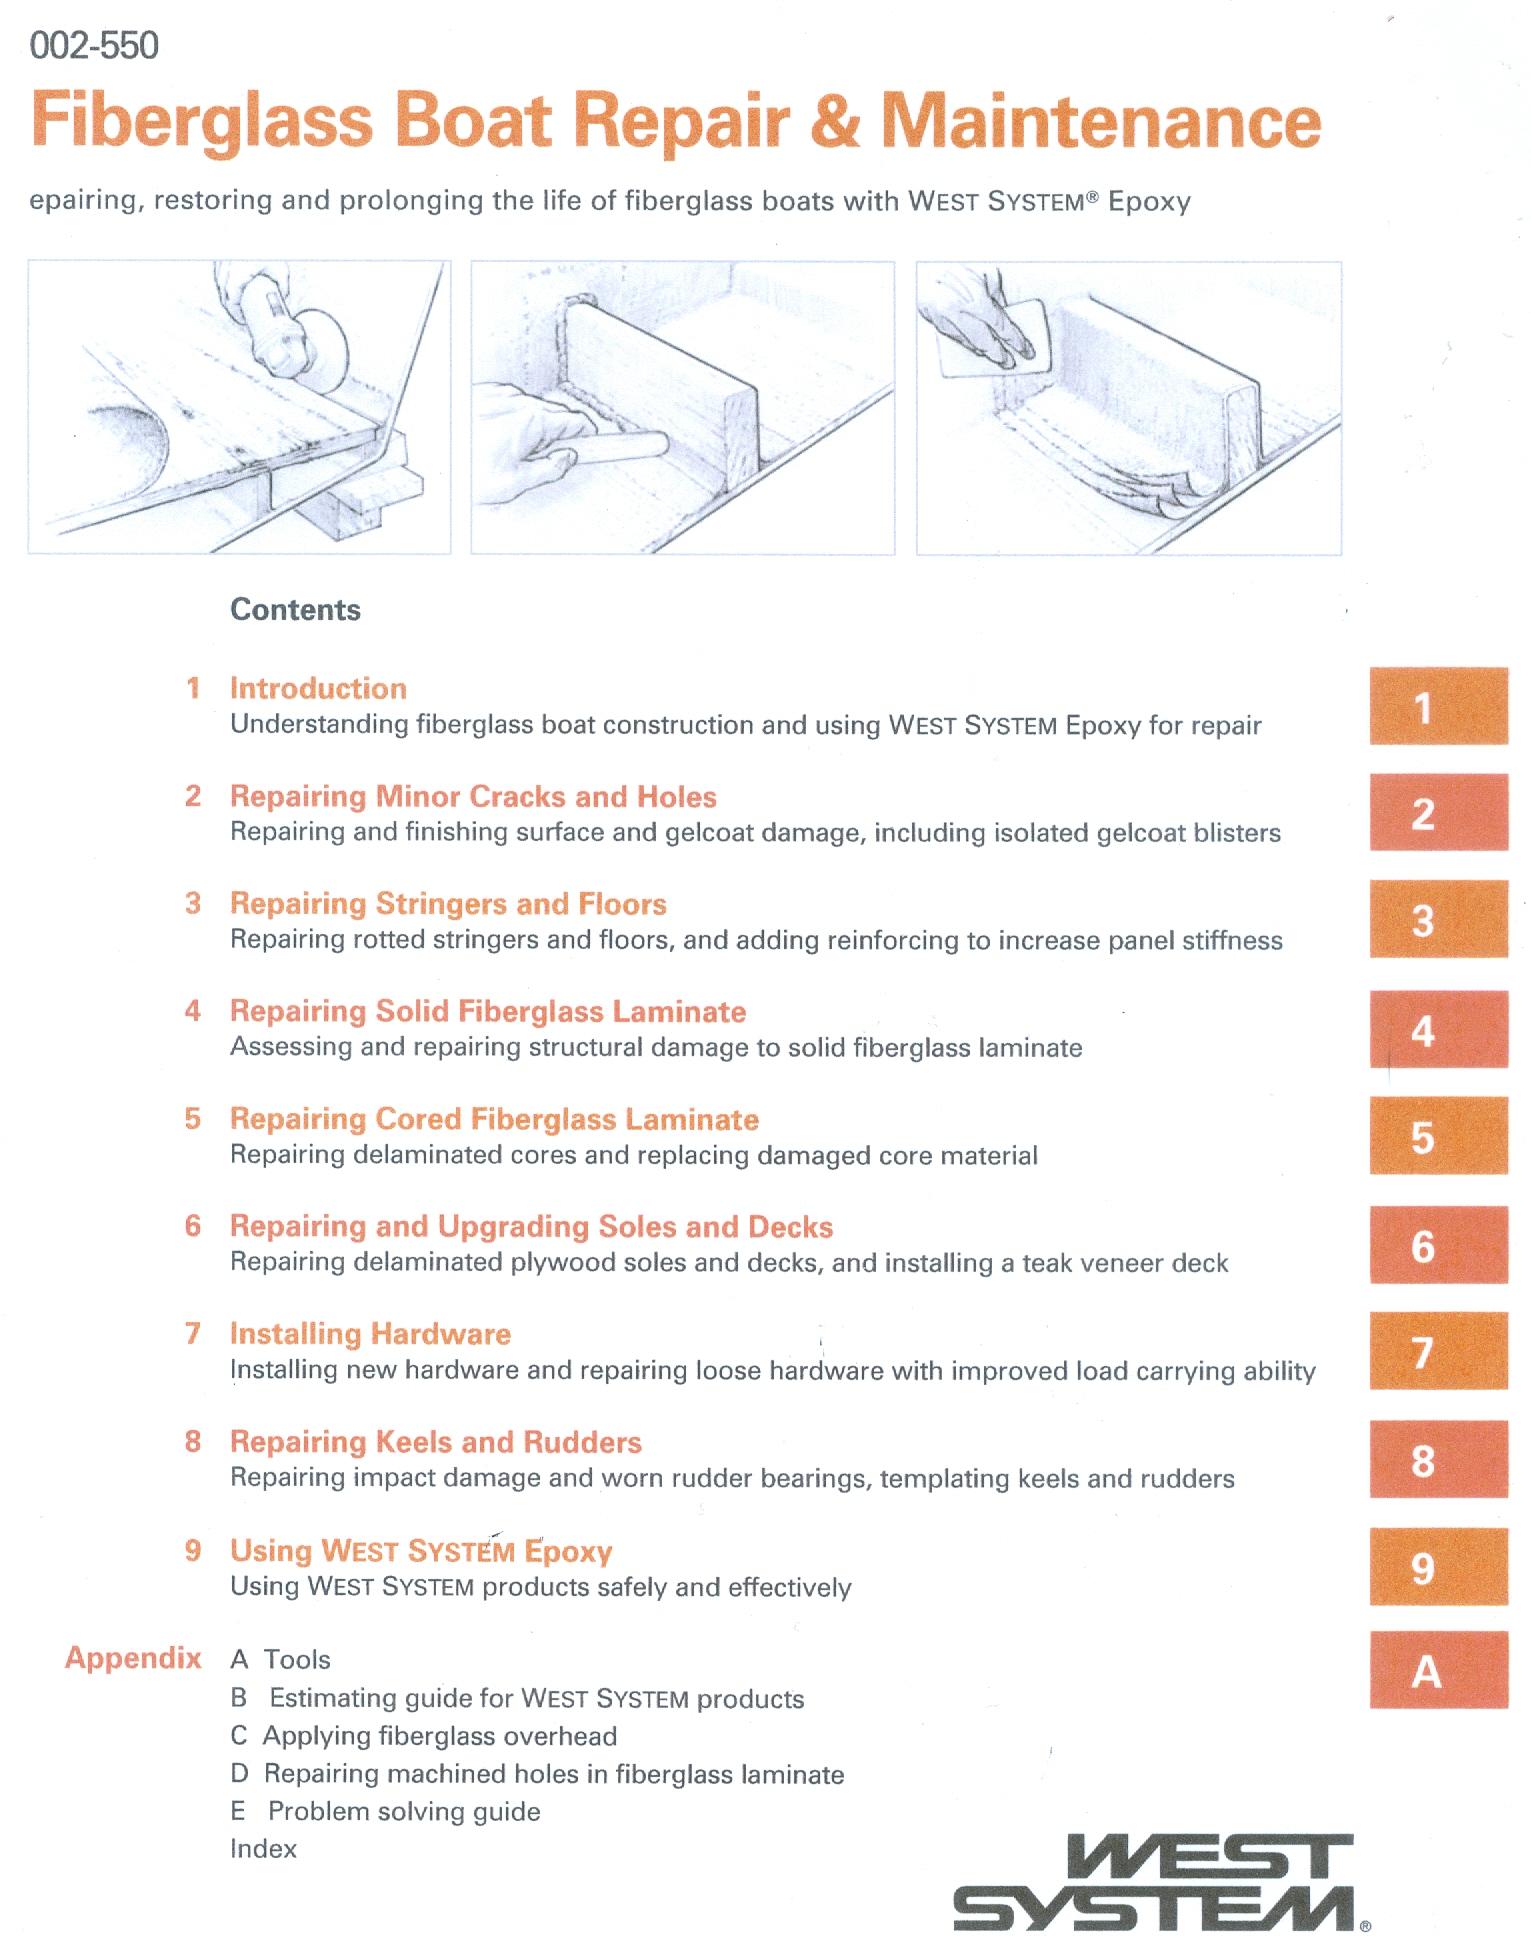 fiberglass boat repair and maintenance rh macnaughtongroup com boat maintenance costs guide Subaru Scheduled Maintenance Guide